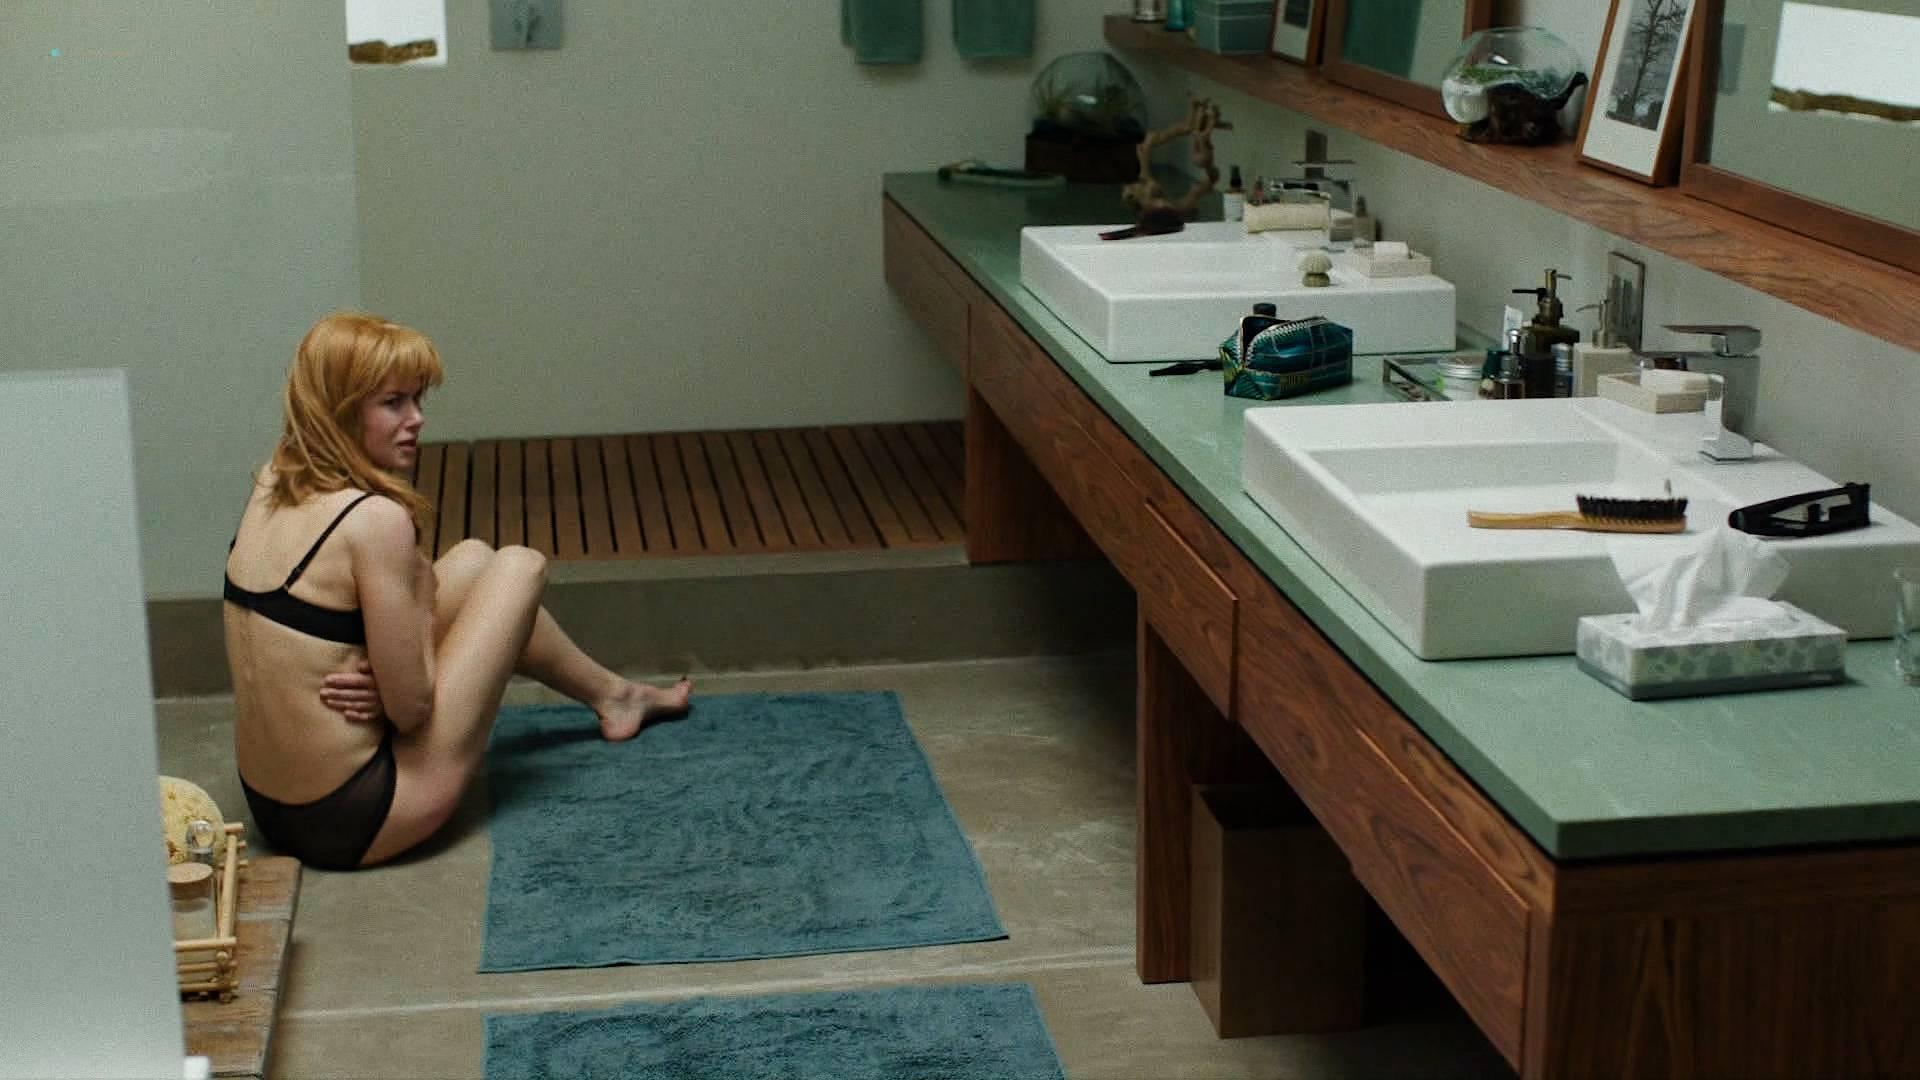 Nicole Kidman nude side boob and butt in the shower - Big Little Lies (2017) s1e7 HD 1080p Web (6)